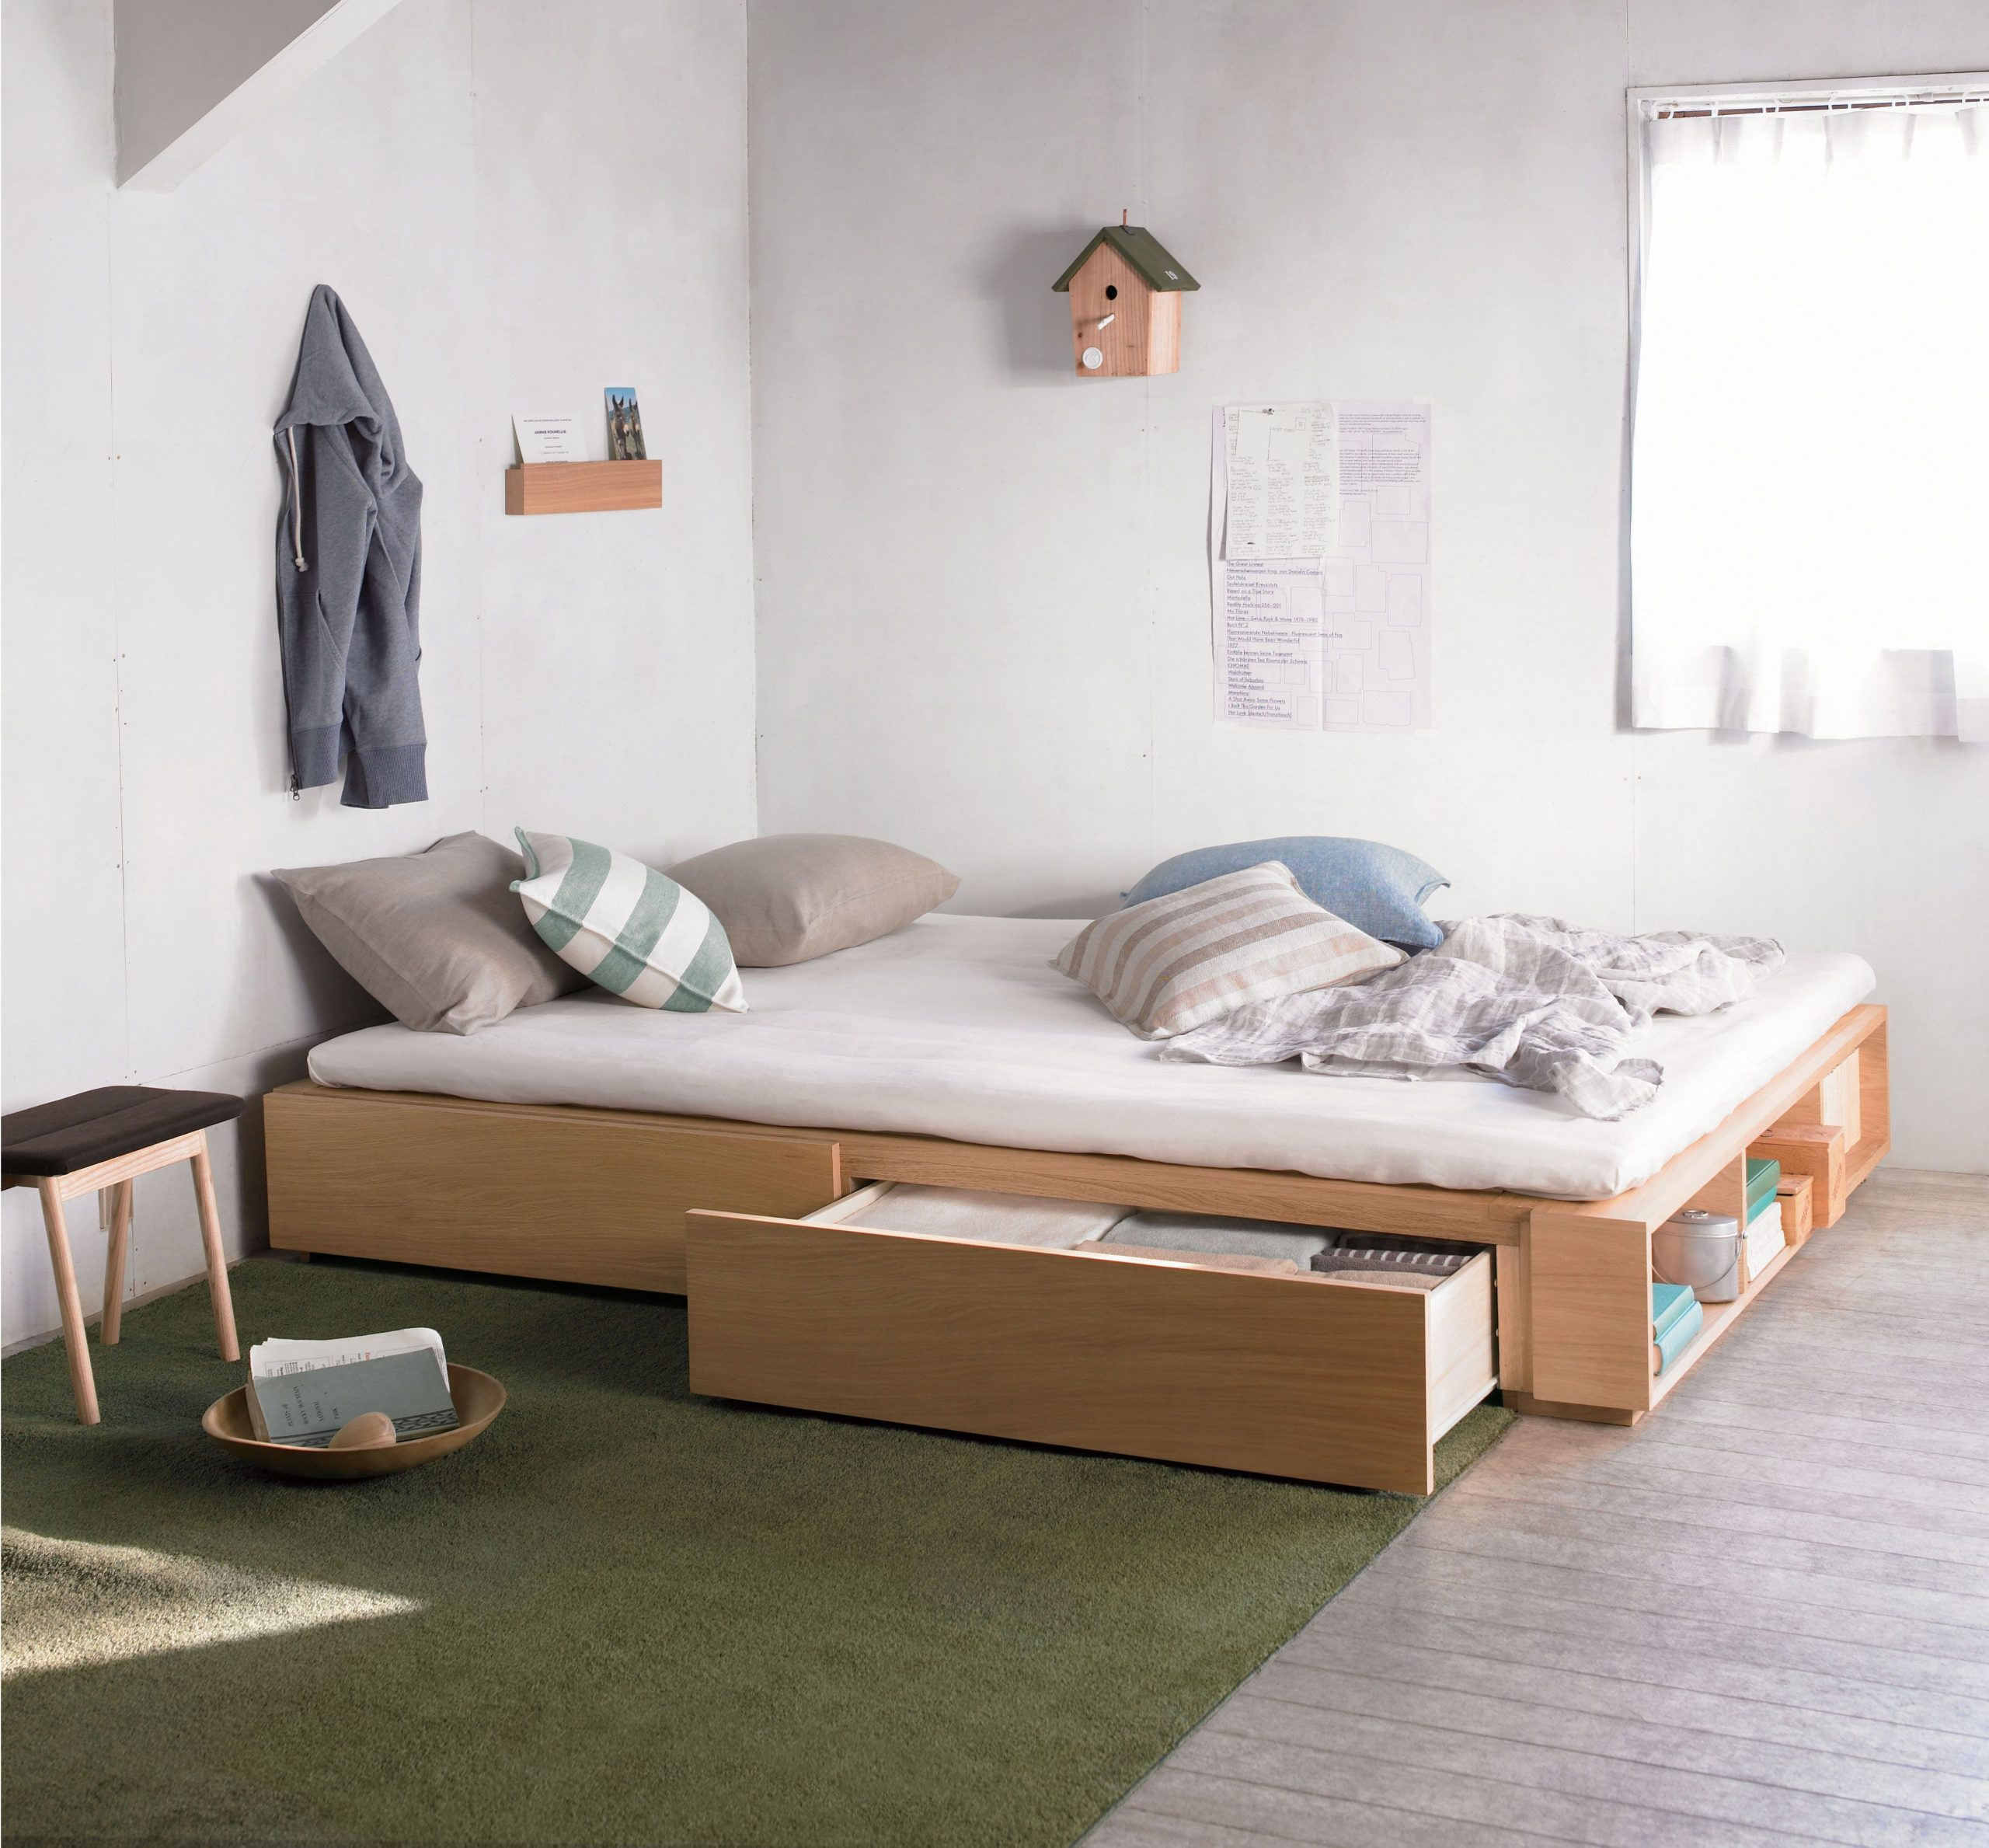 Full Size of Bett Mit Stauraum Ikea Selber Bauen Holz 180x200 200x200 140x200 Diy Betten 120x200 Viel 160x200 100x200 Moderne Doppel Kapitne Komplett Lattenrost Und Bett Betten Mit Stauraum